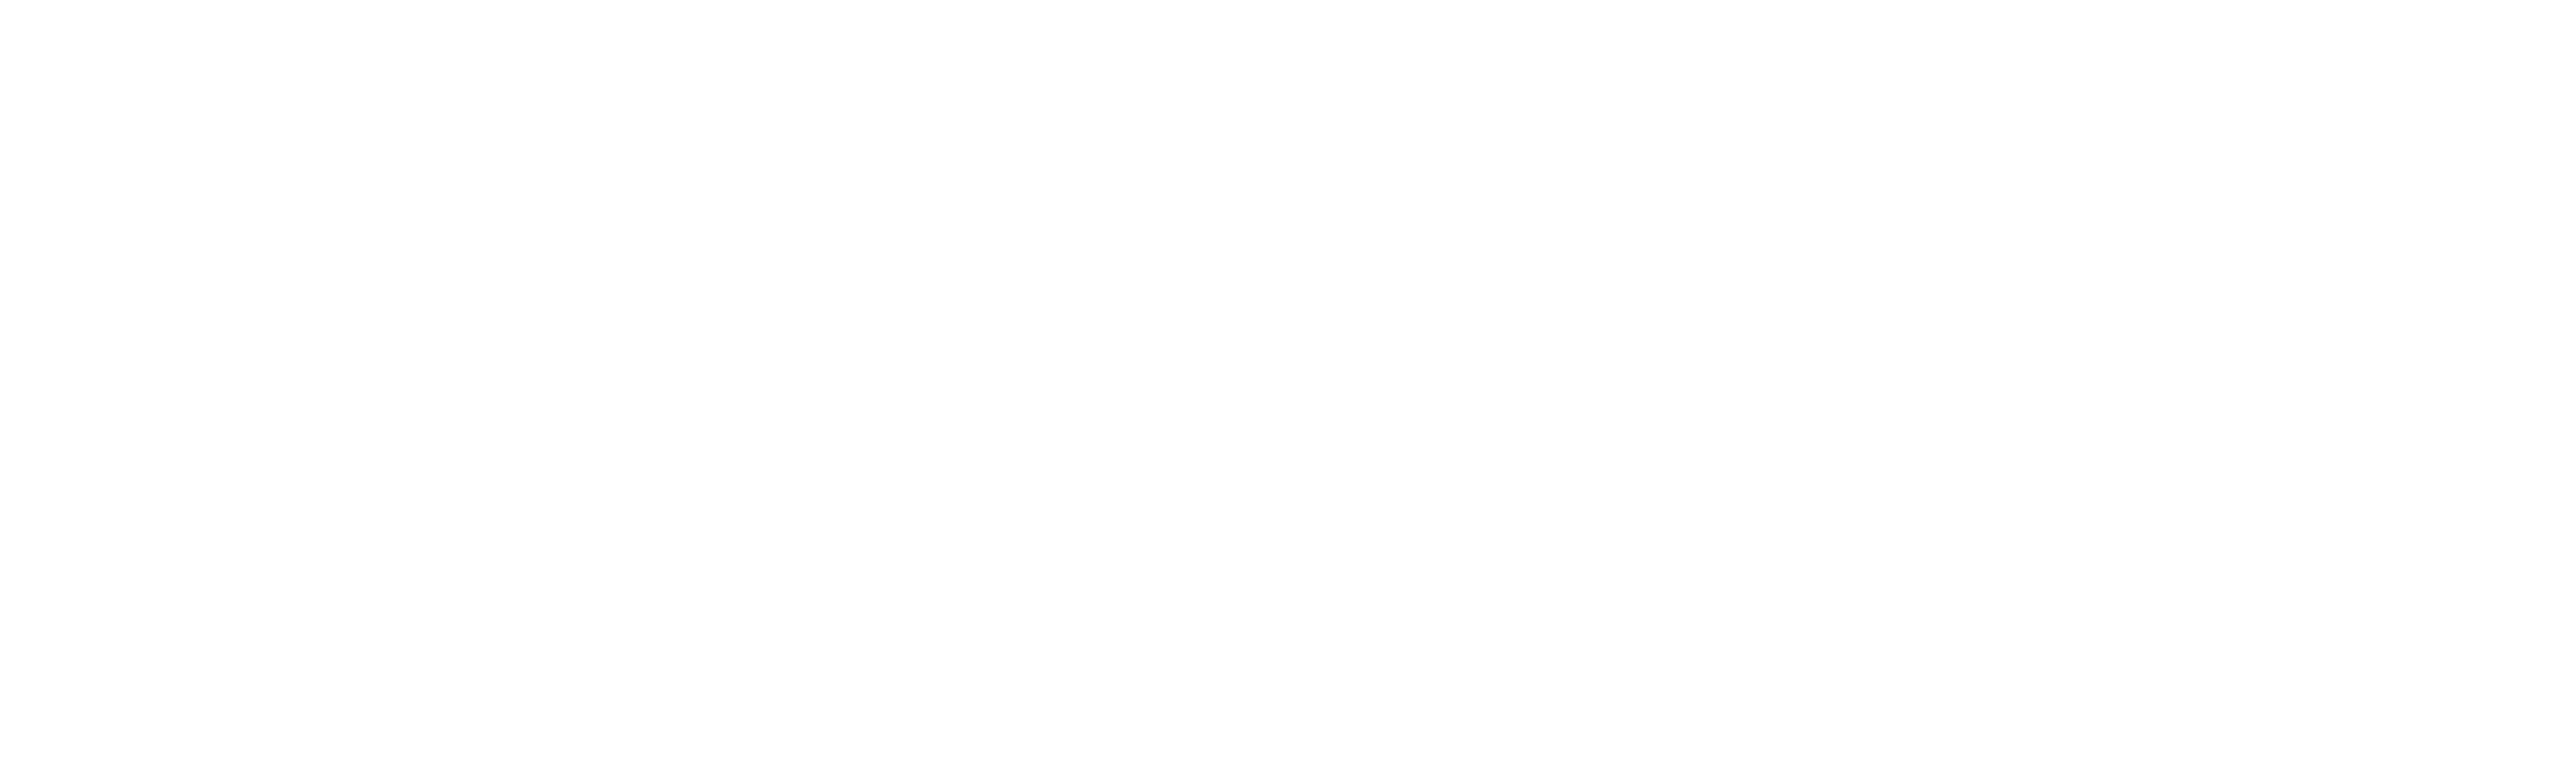 Mergers & Acquisitions Logo